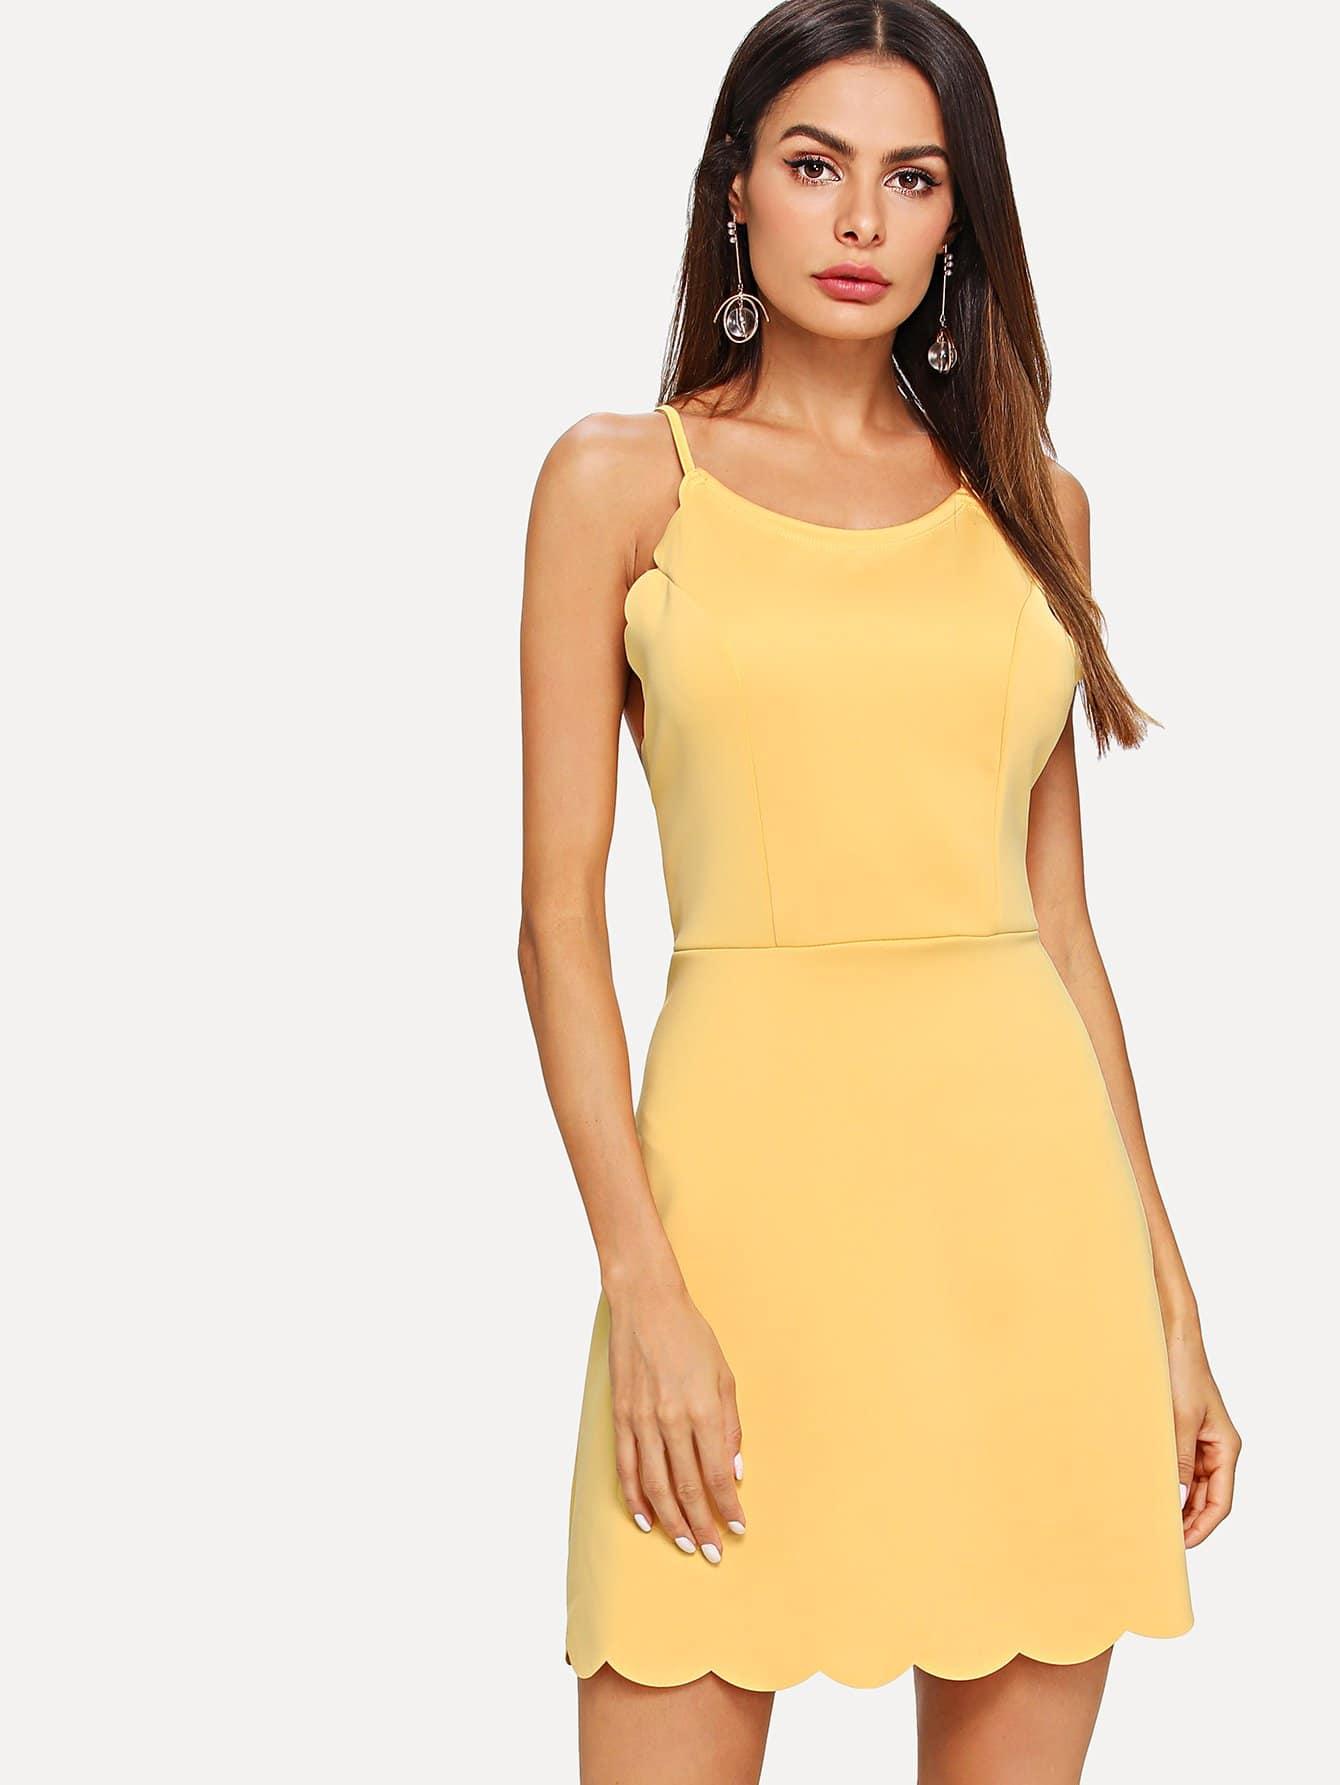 Fit & Flare Scalloped Trim Cami Dress